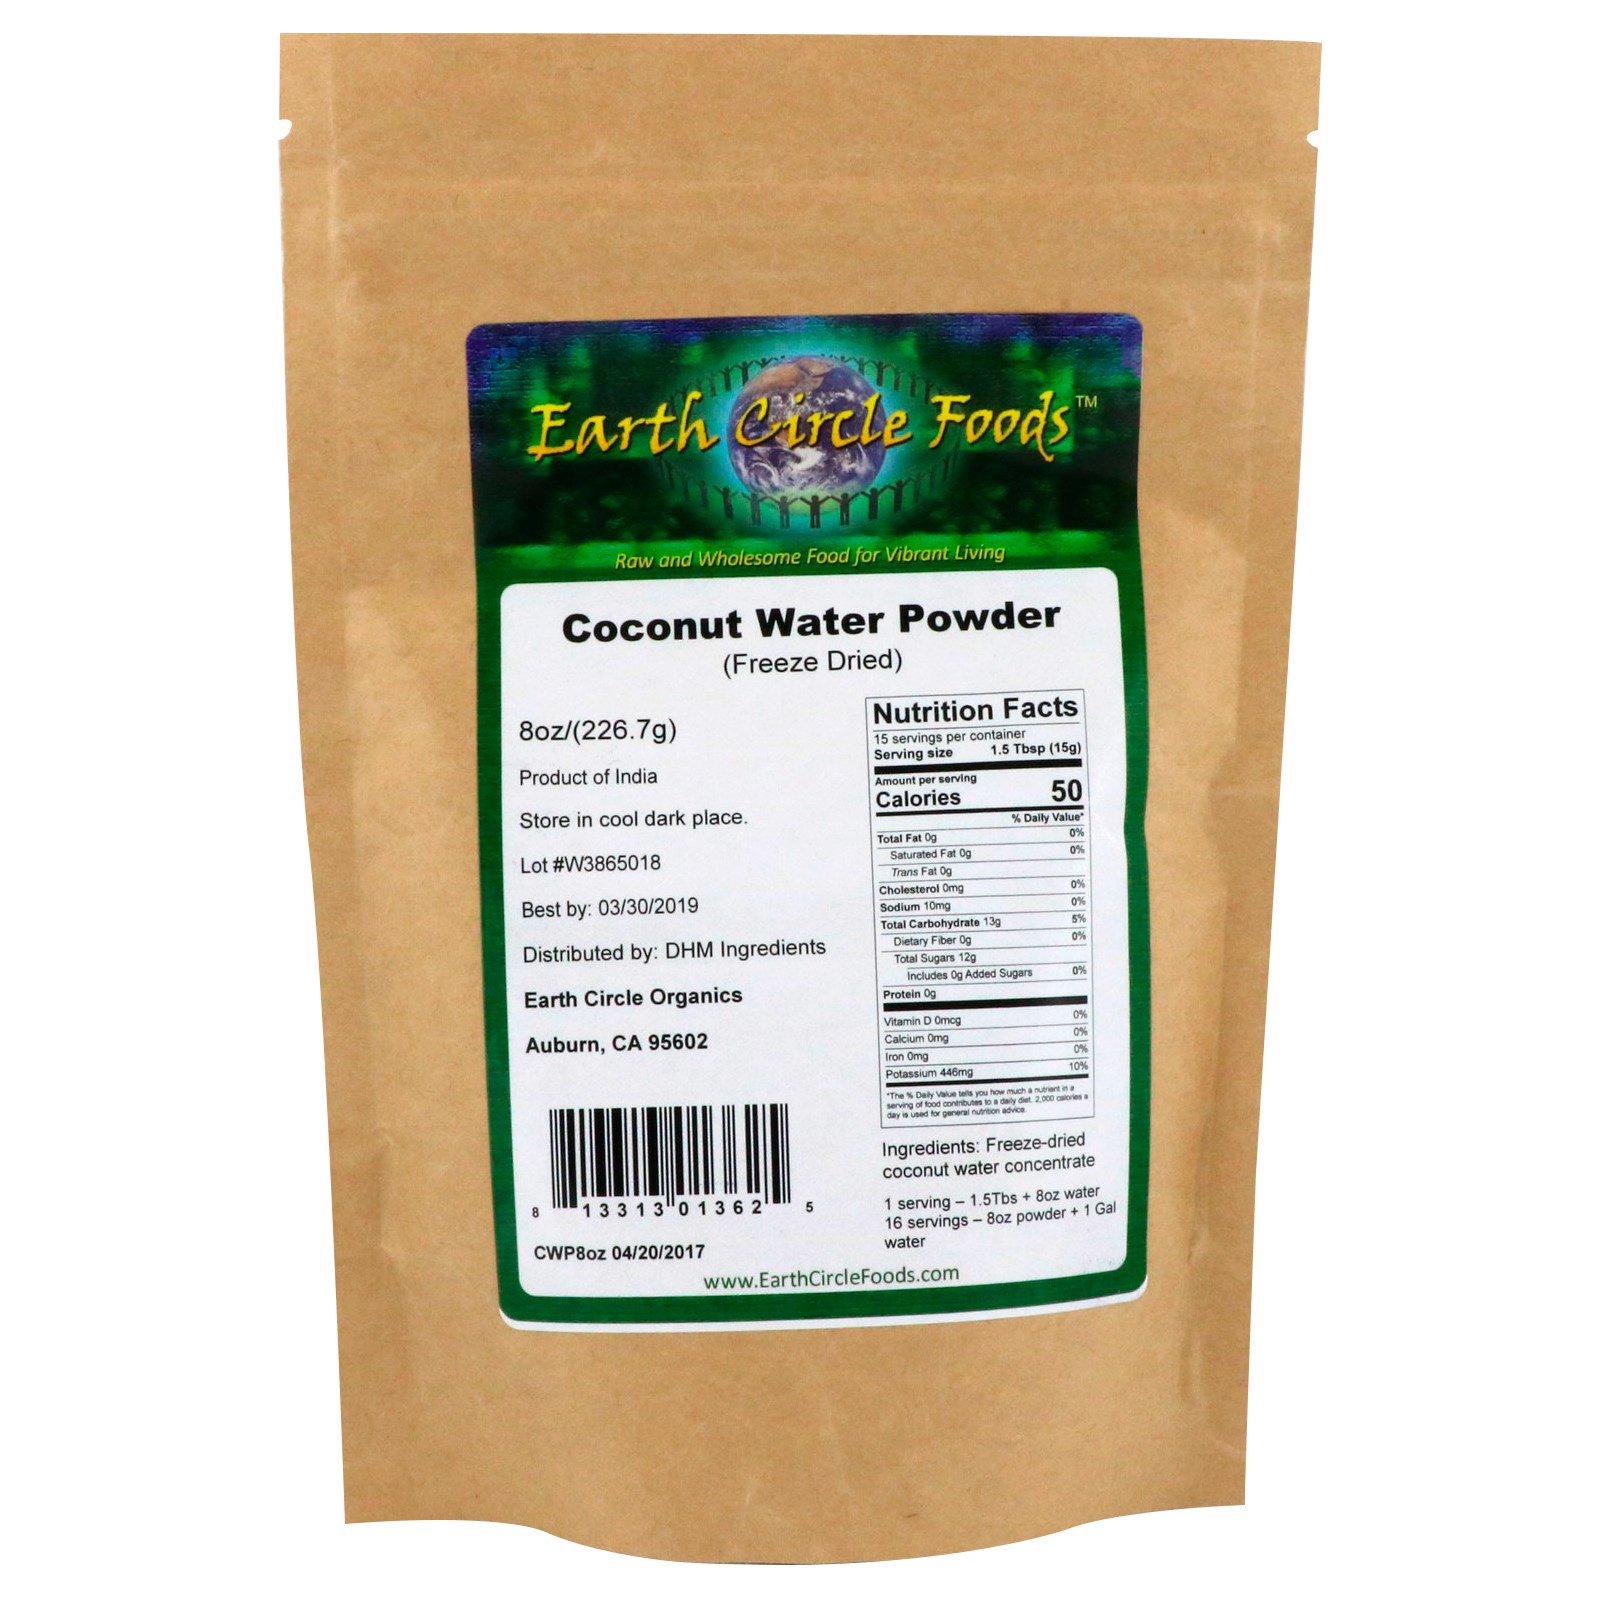 Earth Circle Organics Coconut Water Powder Freeze Dried 8 Oz 2267 G